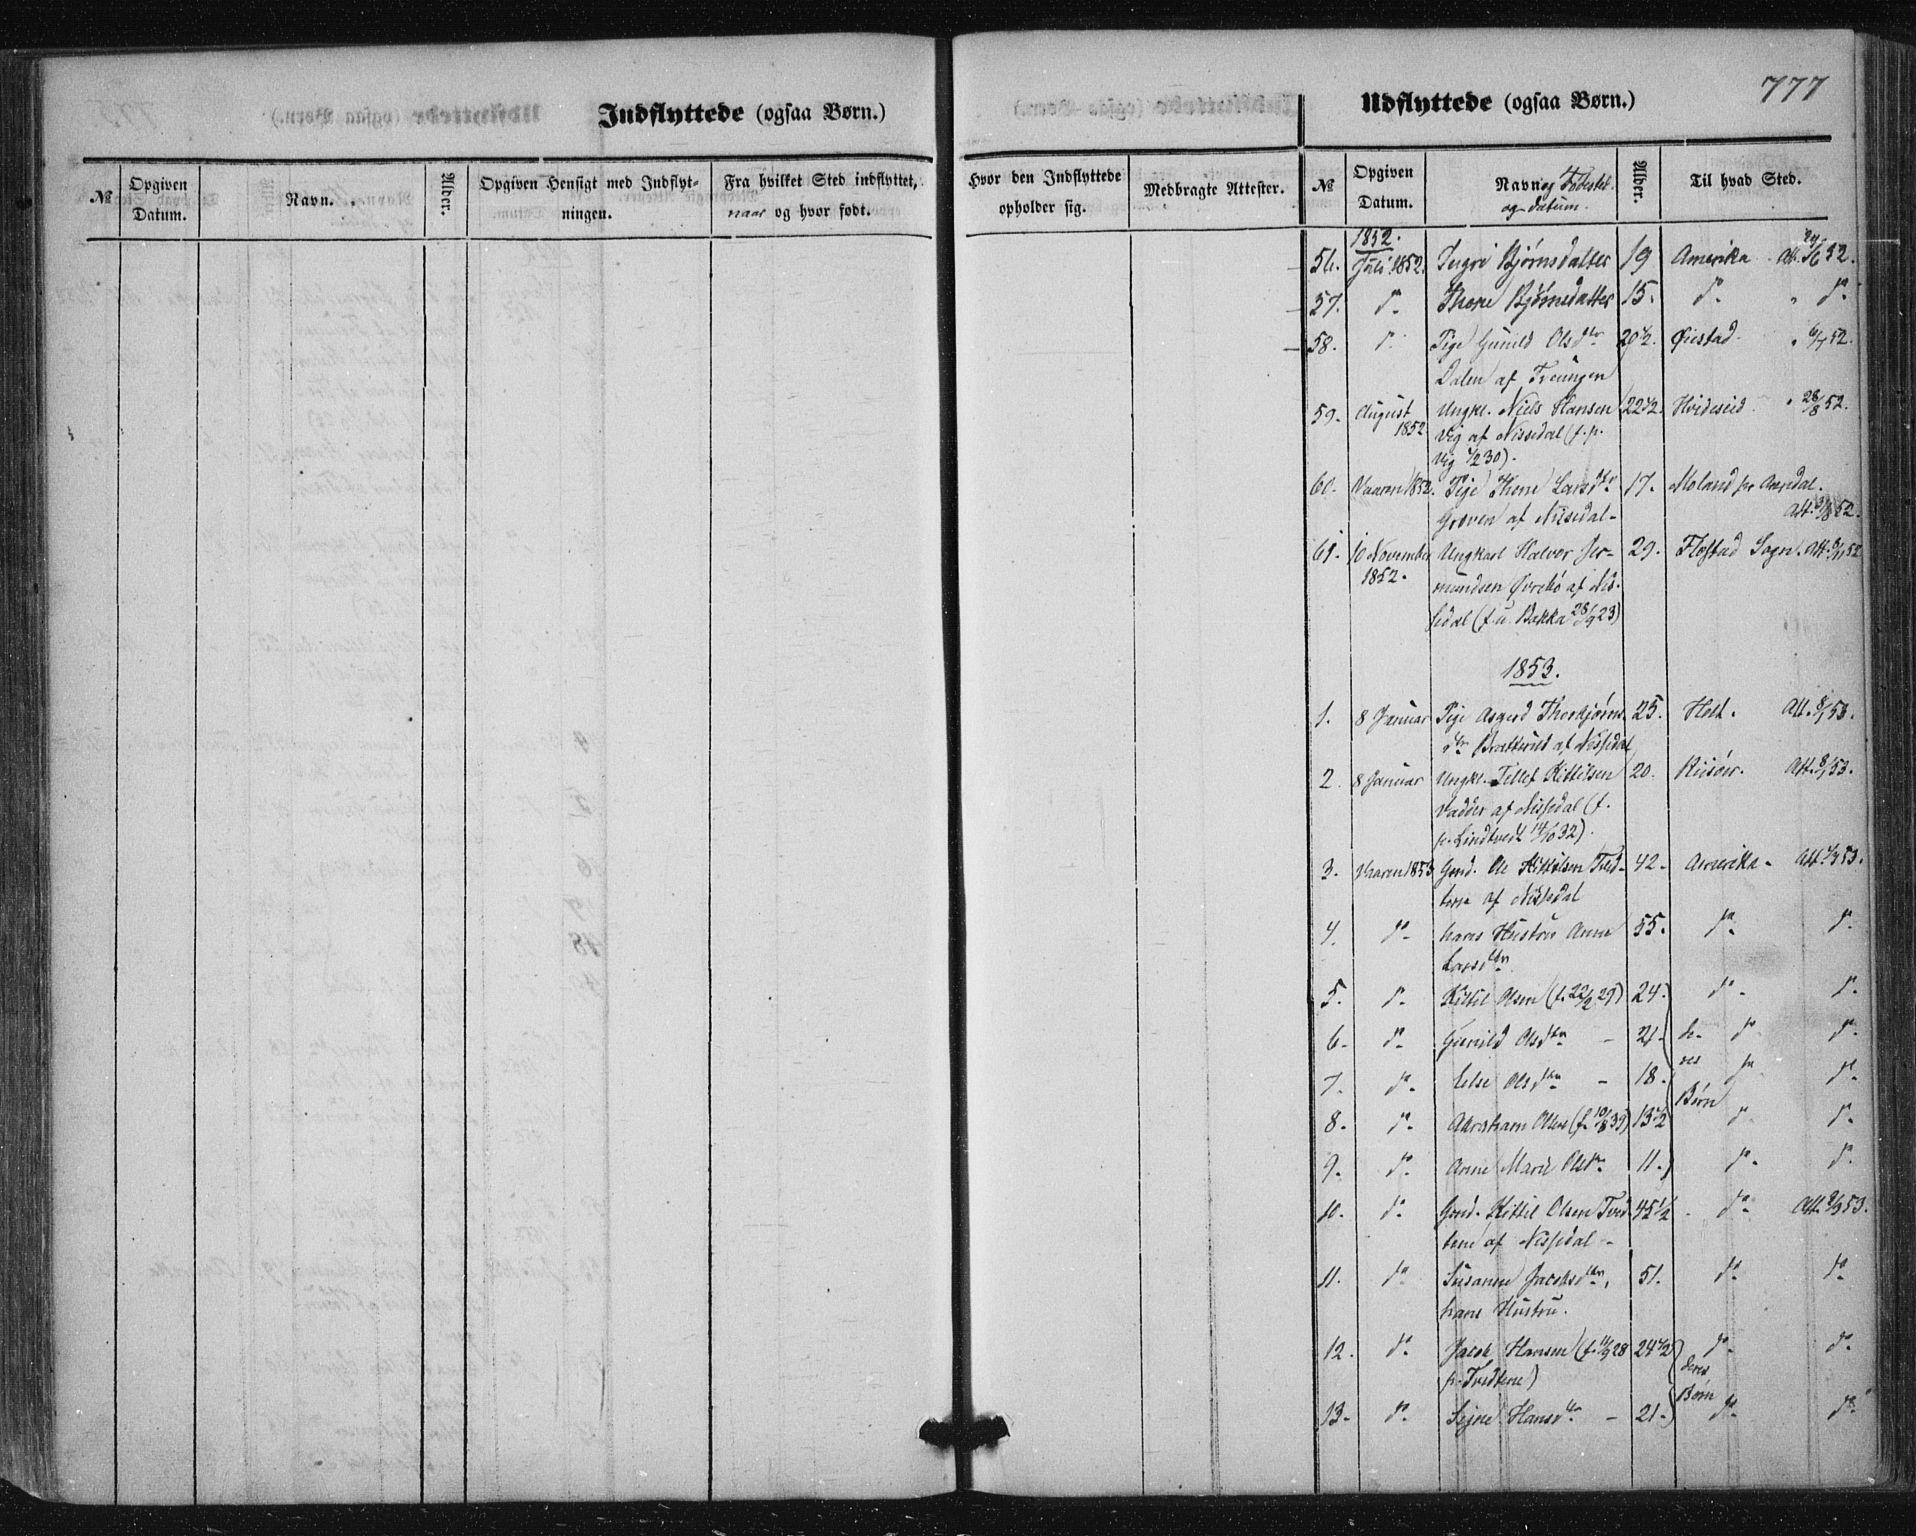 SAKO, Nissedal kirkebøker, F/Fa/L0003: Ministerialbok nr. I 3, 1846-1870, s. 776-777